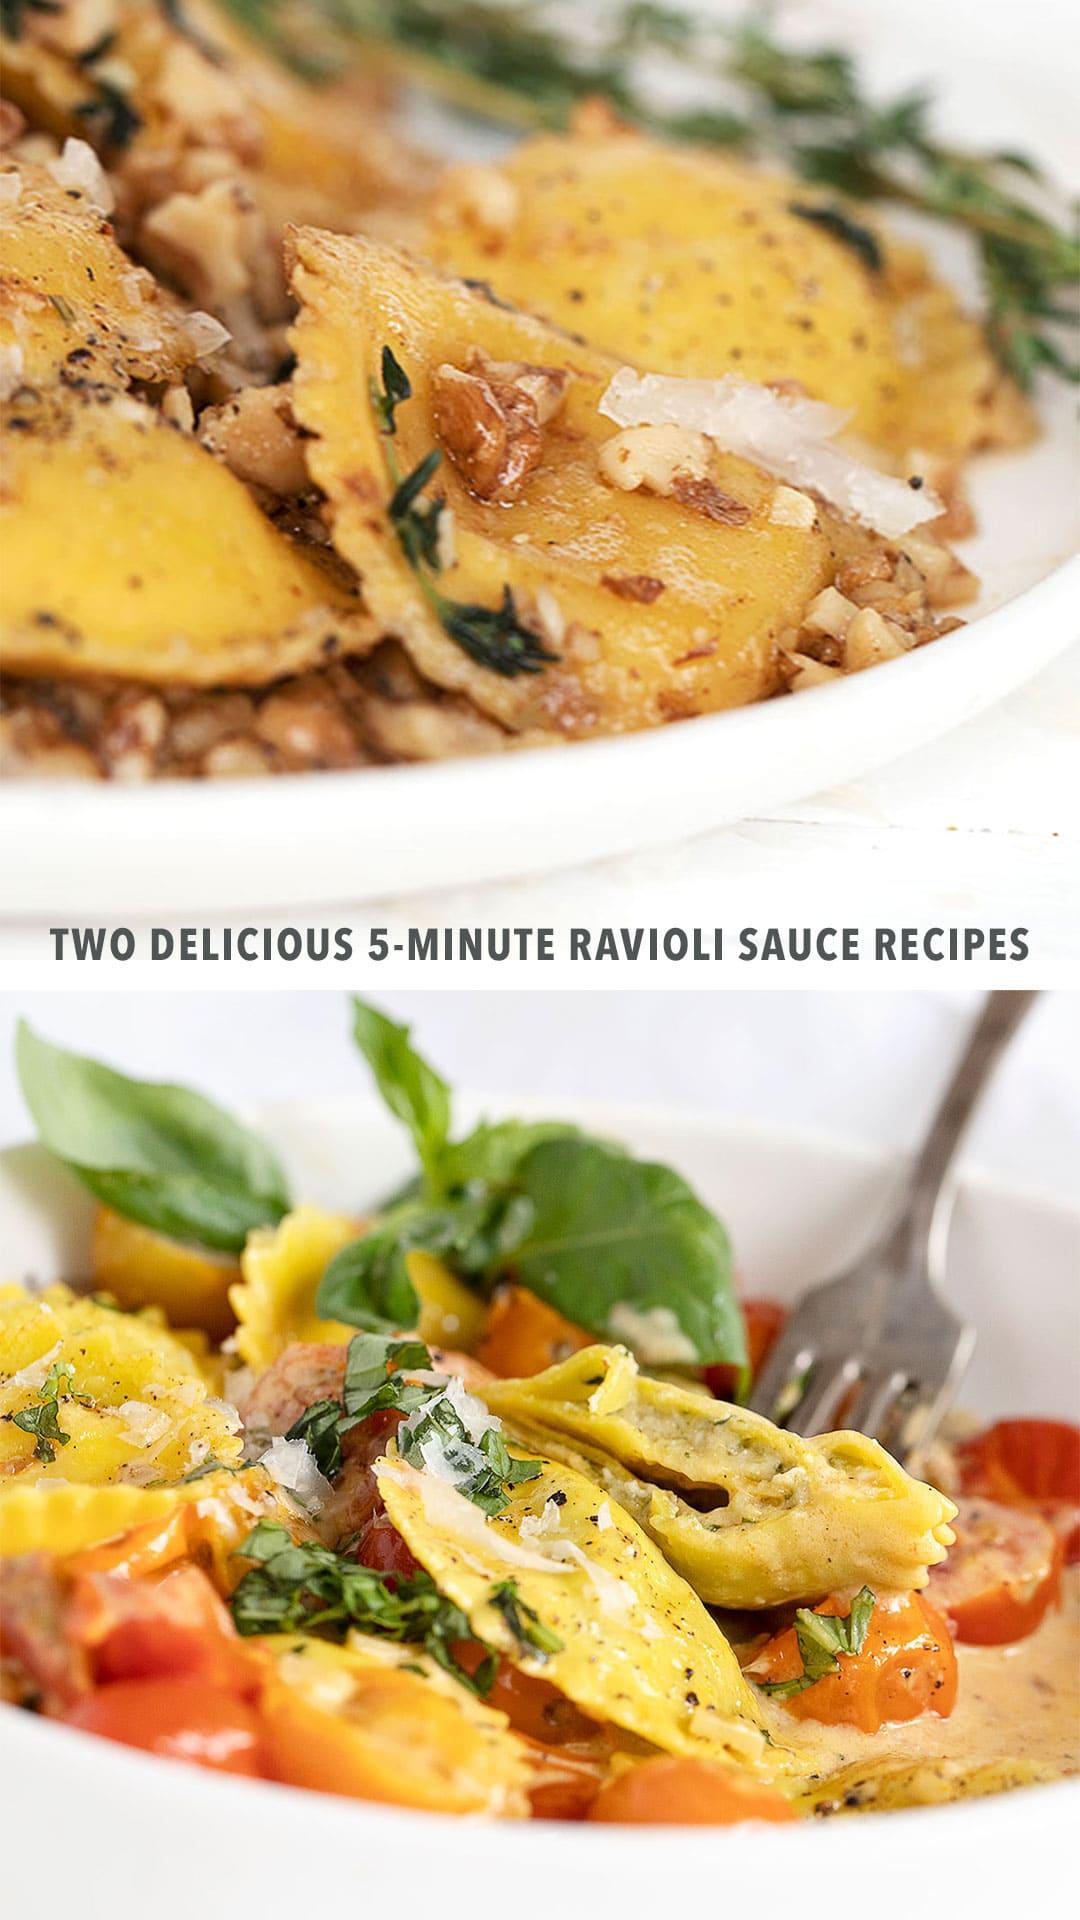 two delicious 5-minute ravioli sauce recipes